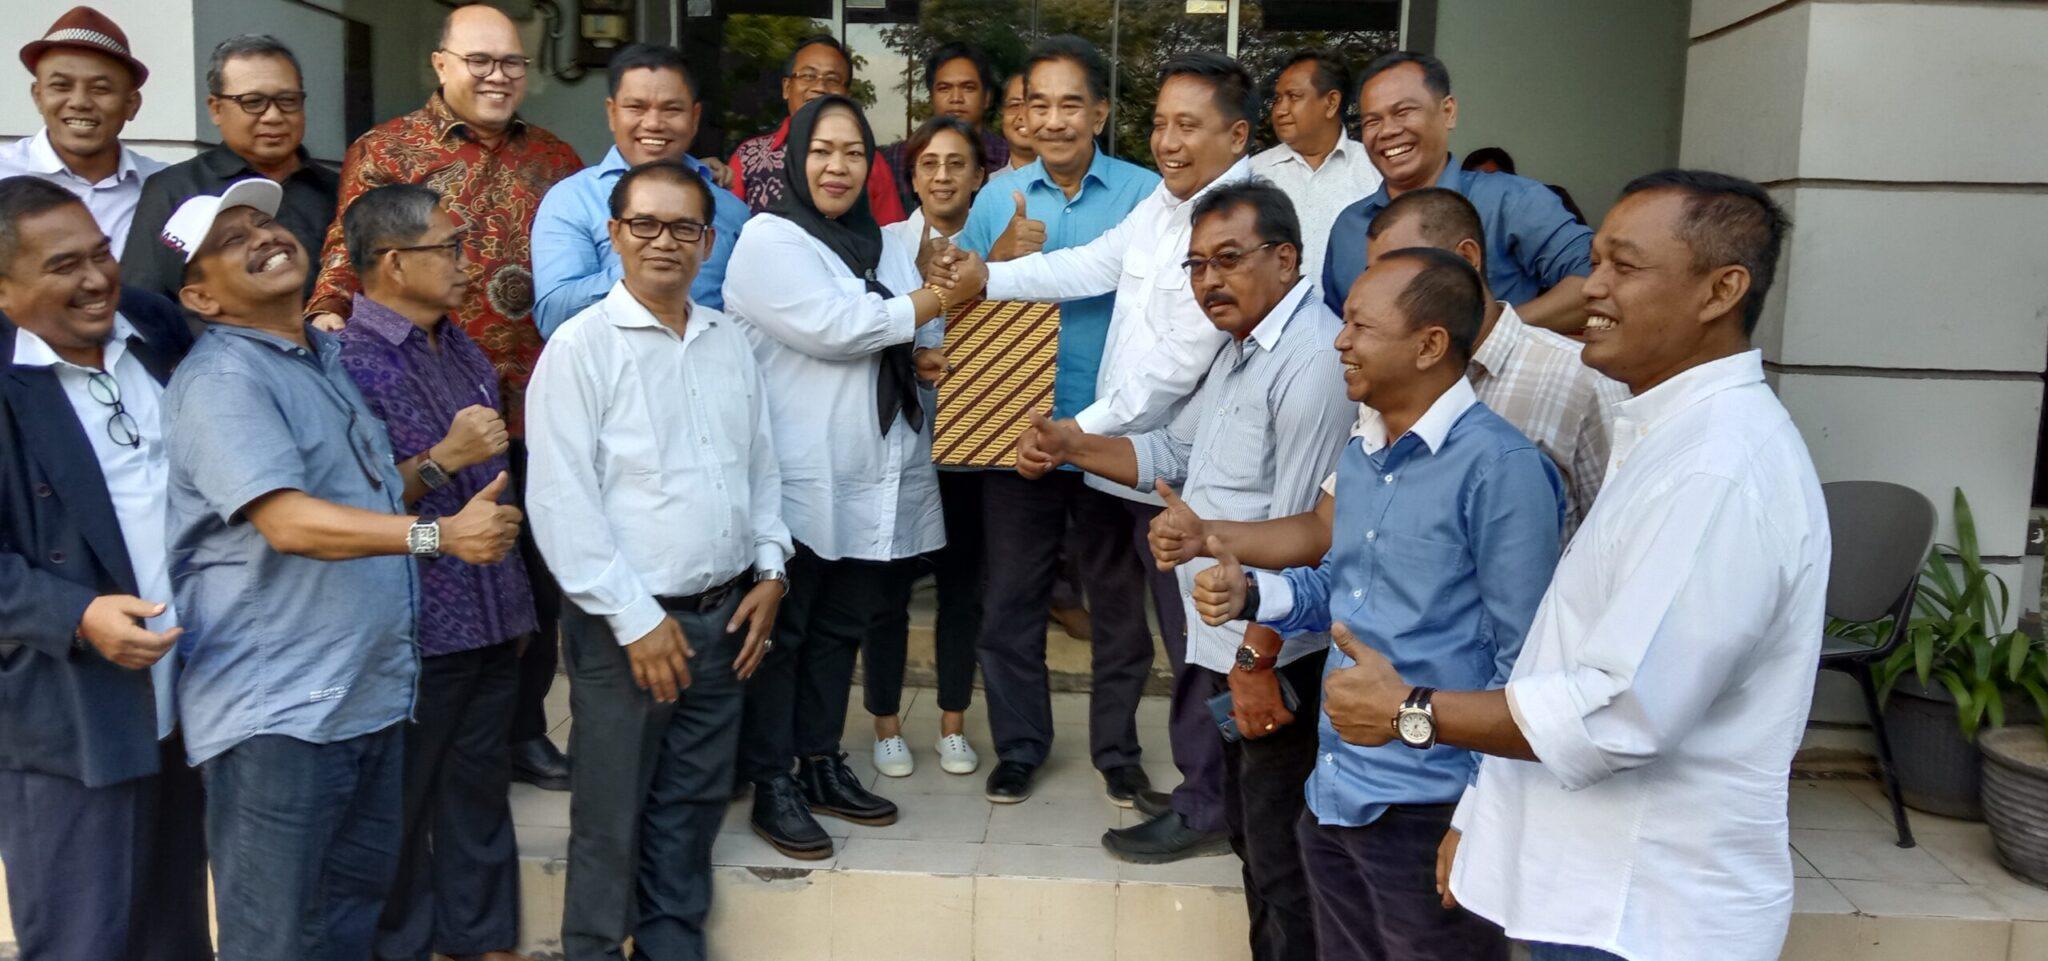 Foto Anggota DPRD Natuna, erwan haryadi, Headline, Kelurahan batu hitam, Musrembang Kabupaten Natuna, natuna, Rapat Musrembang di Natuna